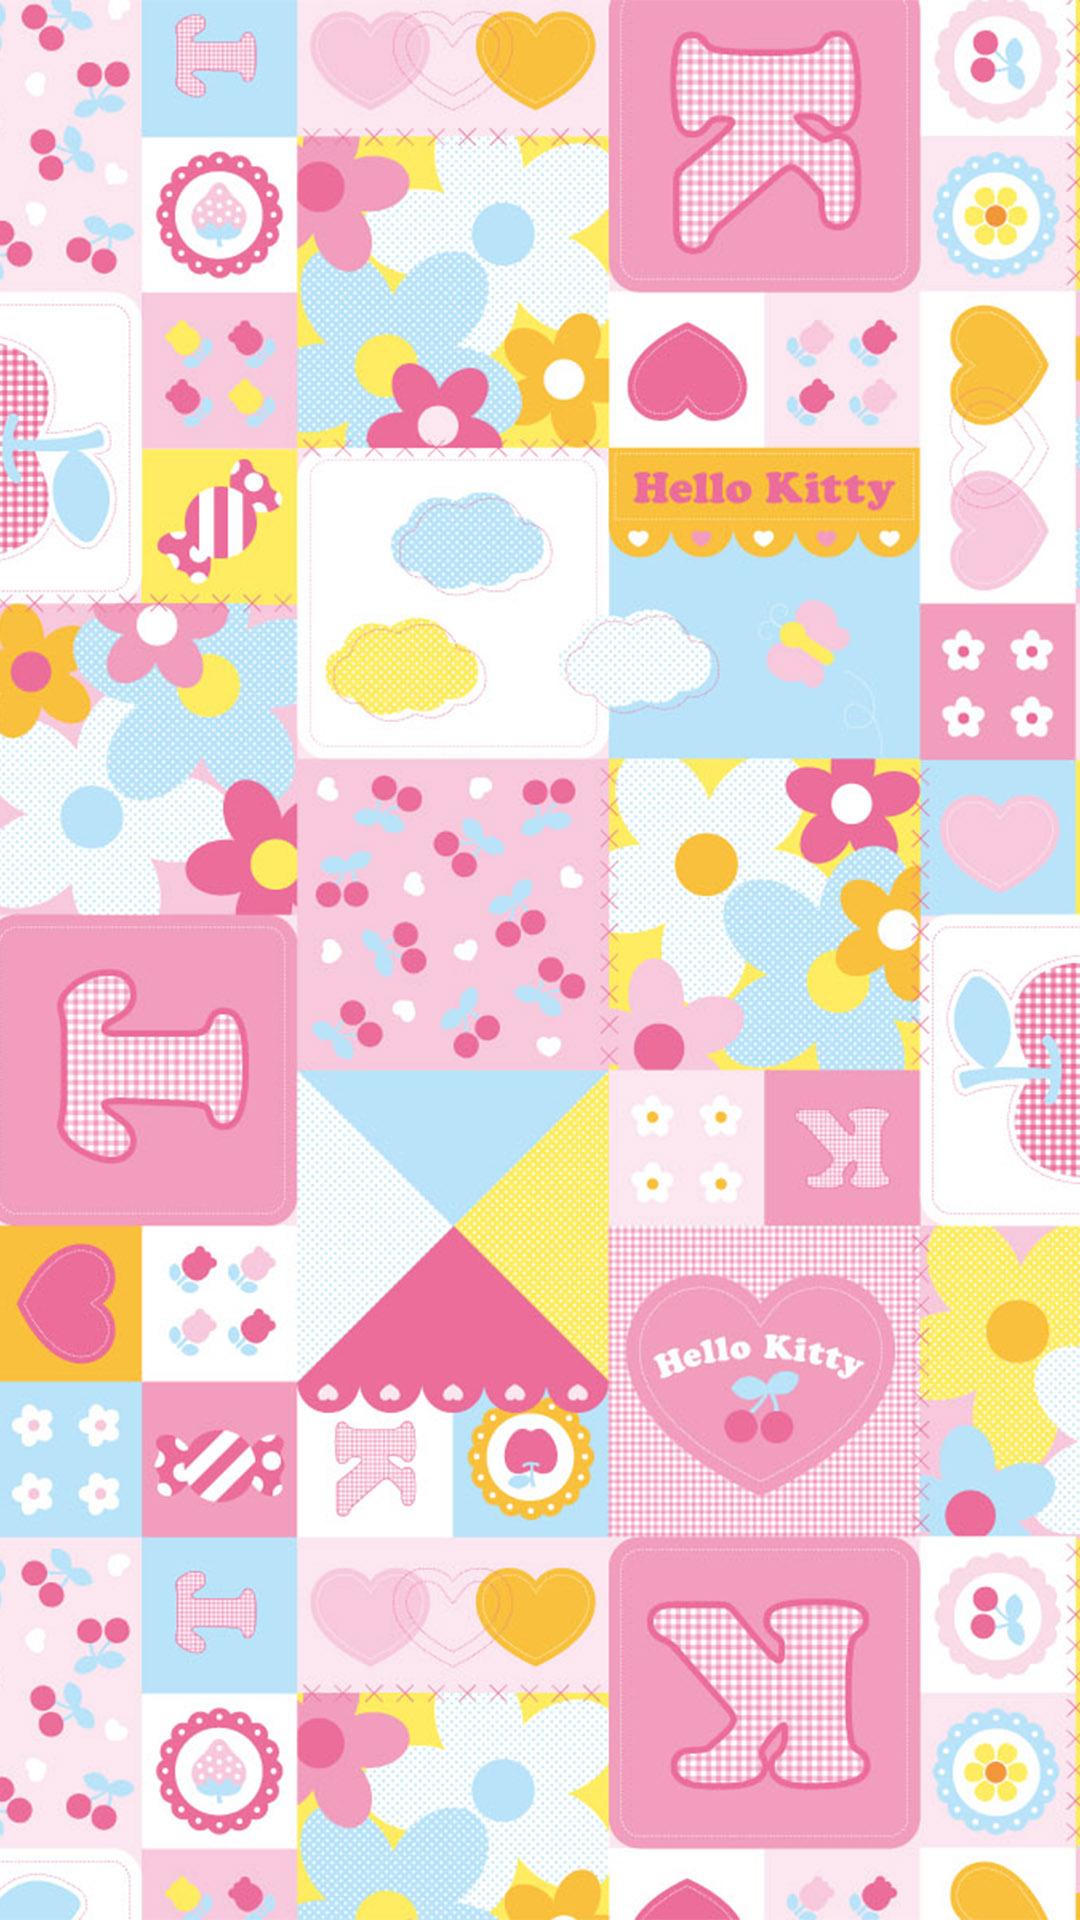 Great Wallpaper Hello Kitty Leopard Print - hello-kitty-wallpaper-10_e237b51230812d7e6b1201cc5c1f48f3_raw  Image_796514.jpg